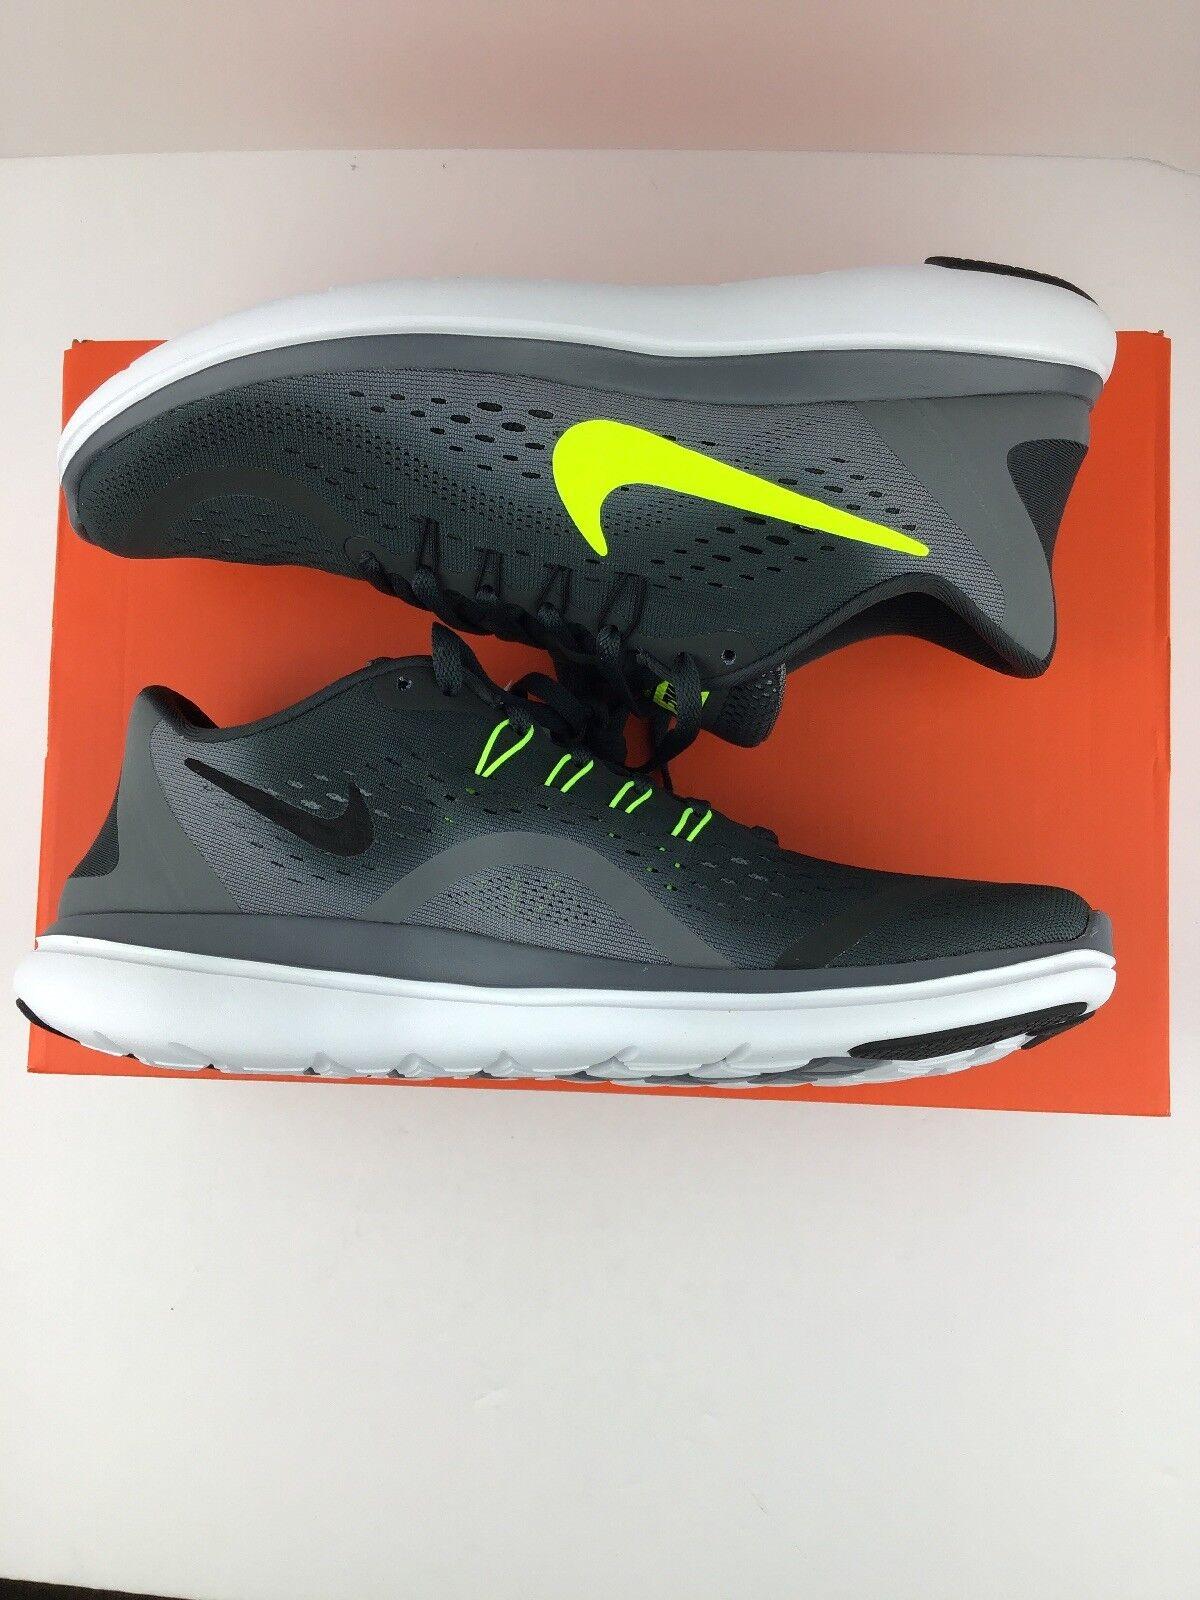 586809a64e03 Nike Flex 2017 RN Anthracite Volt Cool Grey Men s Men s Men s Running Shoes  NEW N12-25-67 8487b0